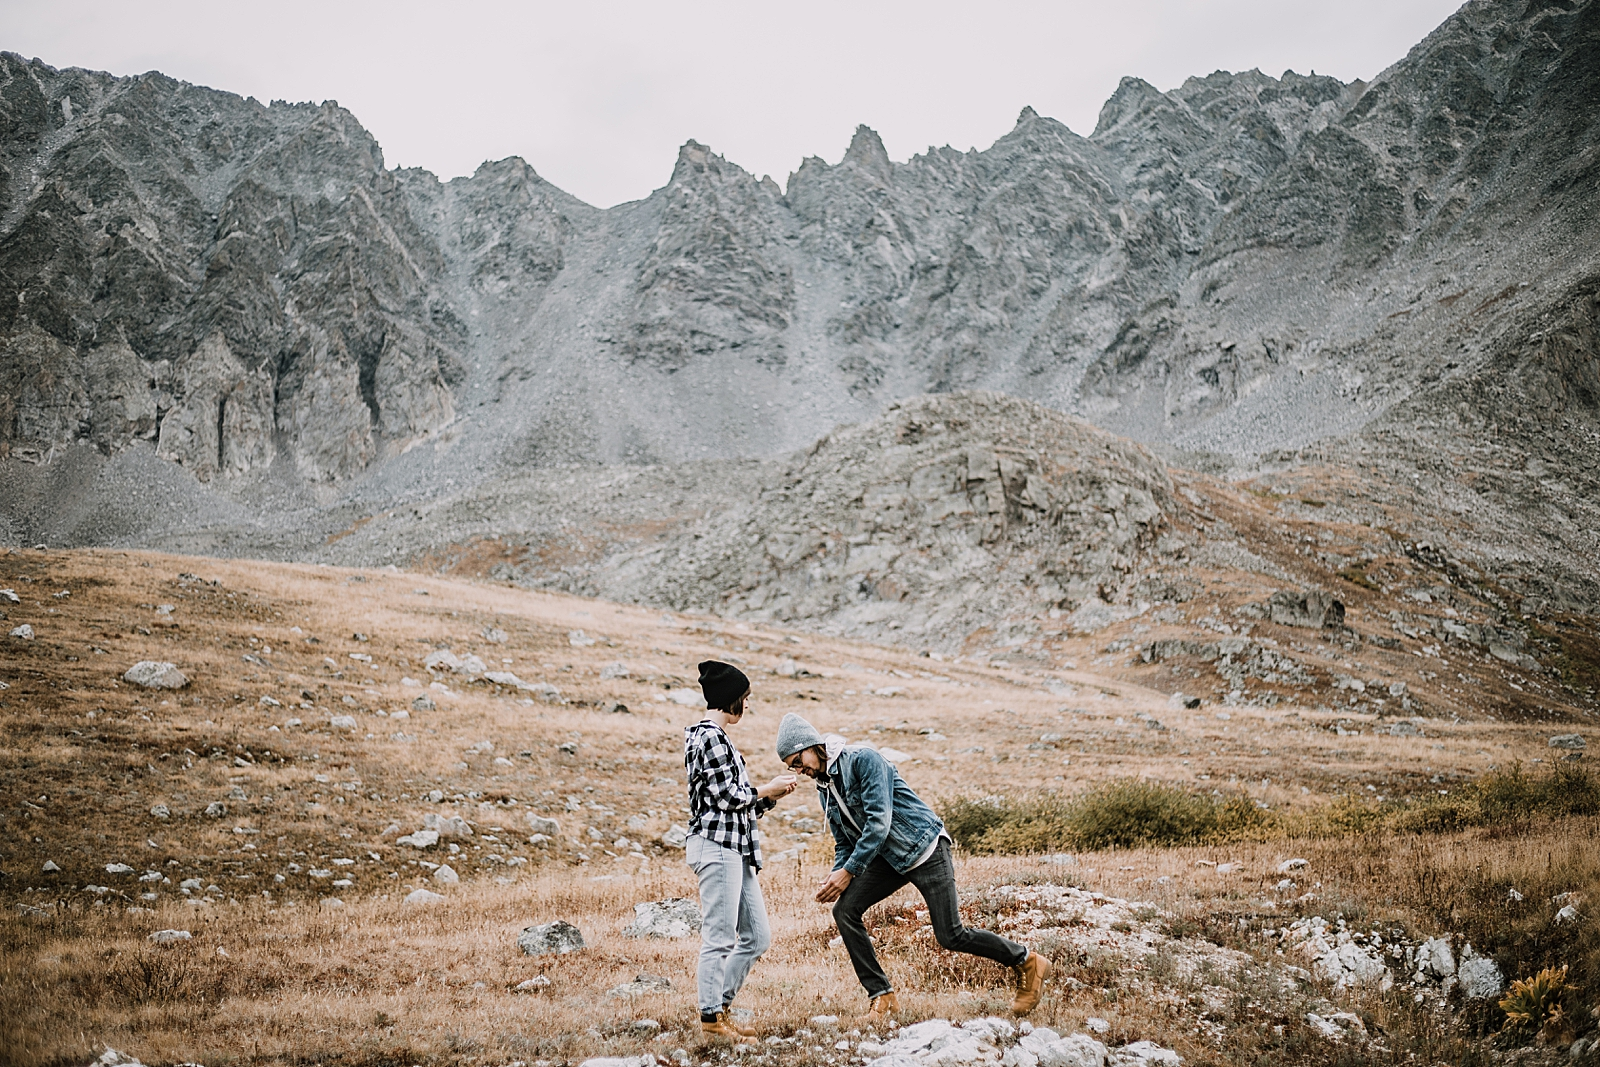 colorado mountain proposal, hike mayflower gulch, mayflower gulch proposal, mayflower gulch elopement, mayflower gulch wedding, mayflower gulch engagments, leadville elopement, leadville wedding